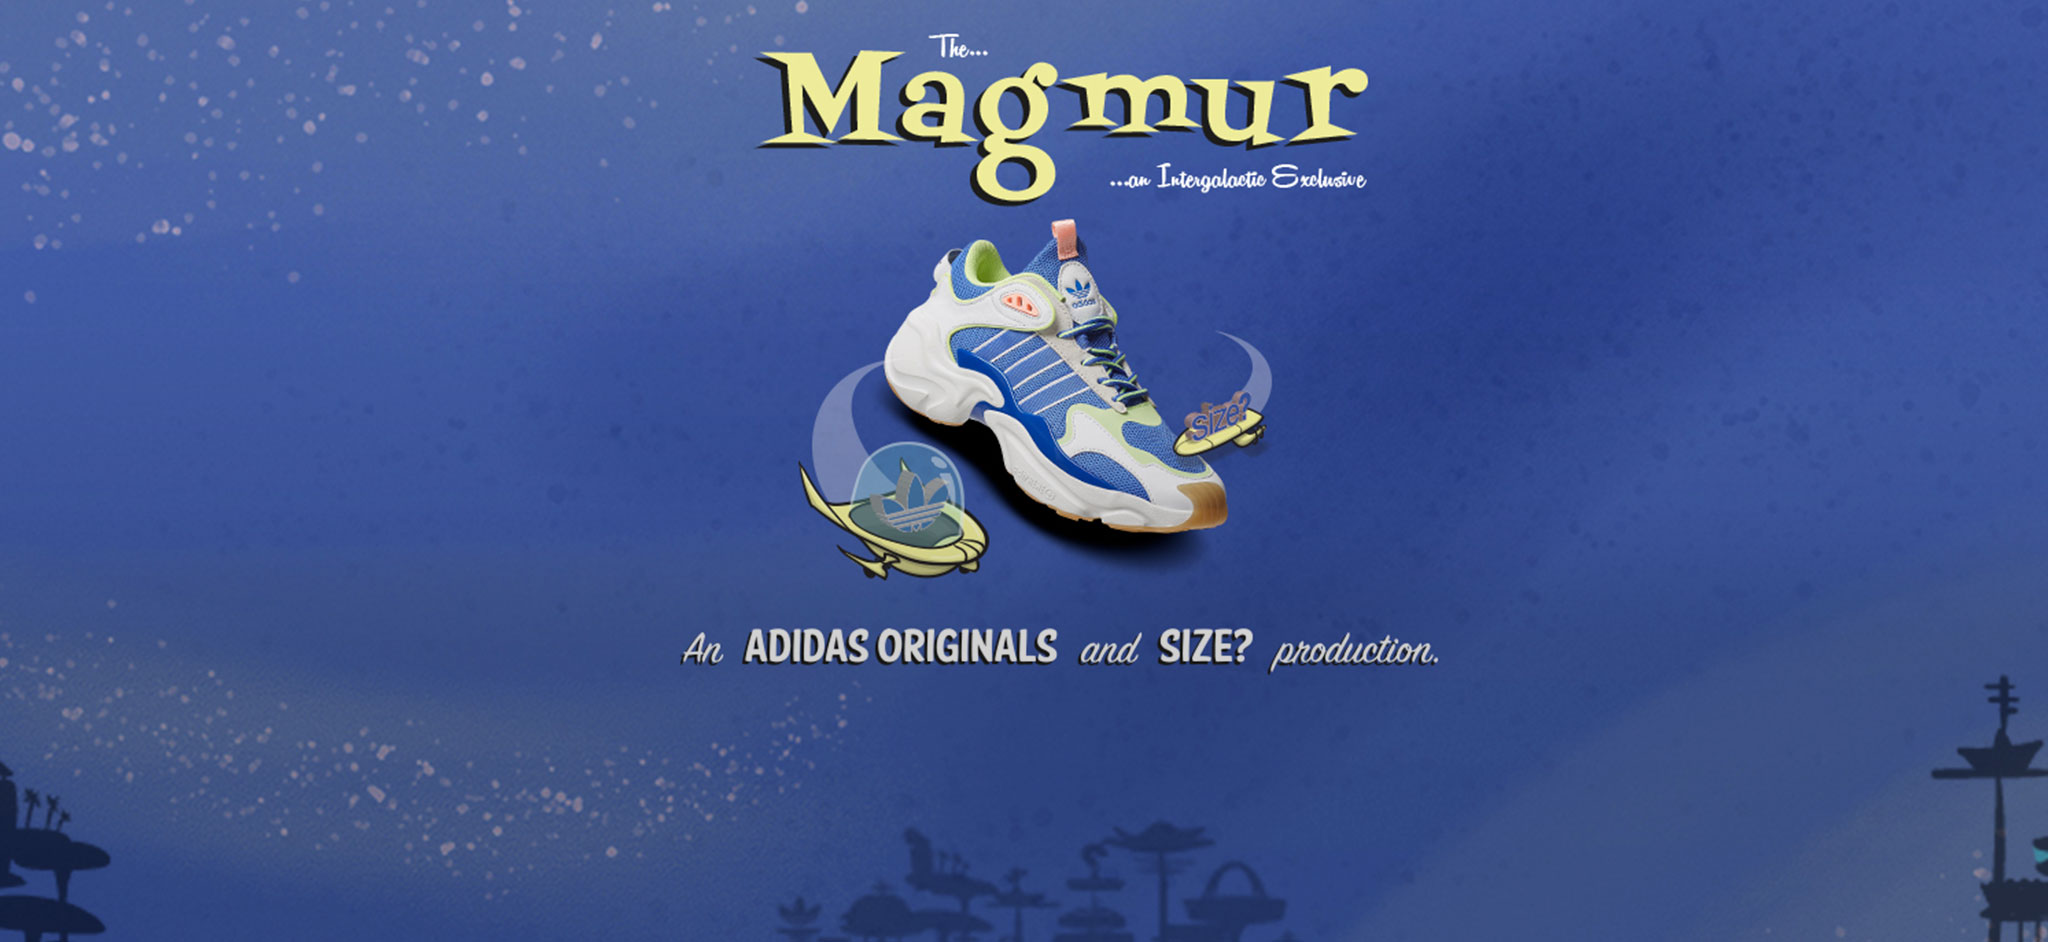 adidas Originals Magmur - Exclusivité size?